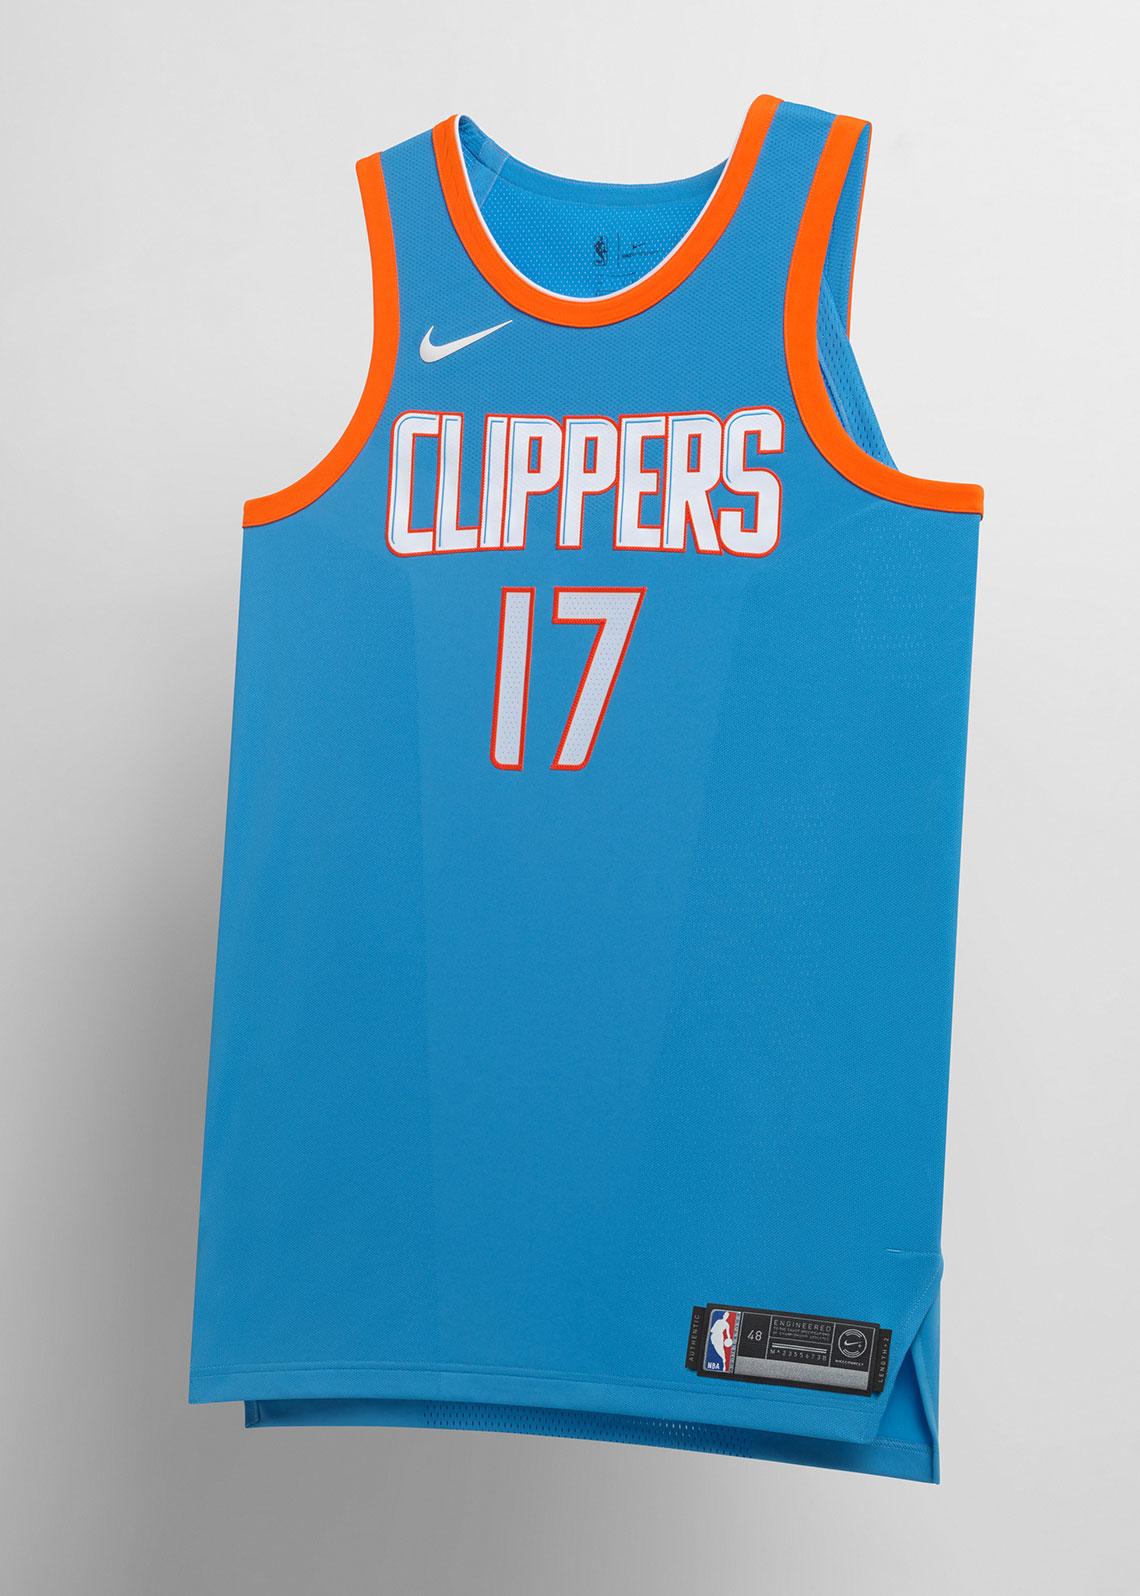 090529c9fe9 Nike NBA City Edition Uniforms | SneakerNews.com